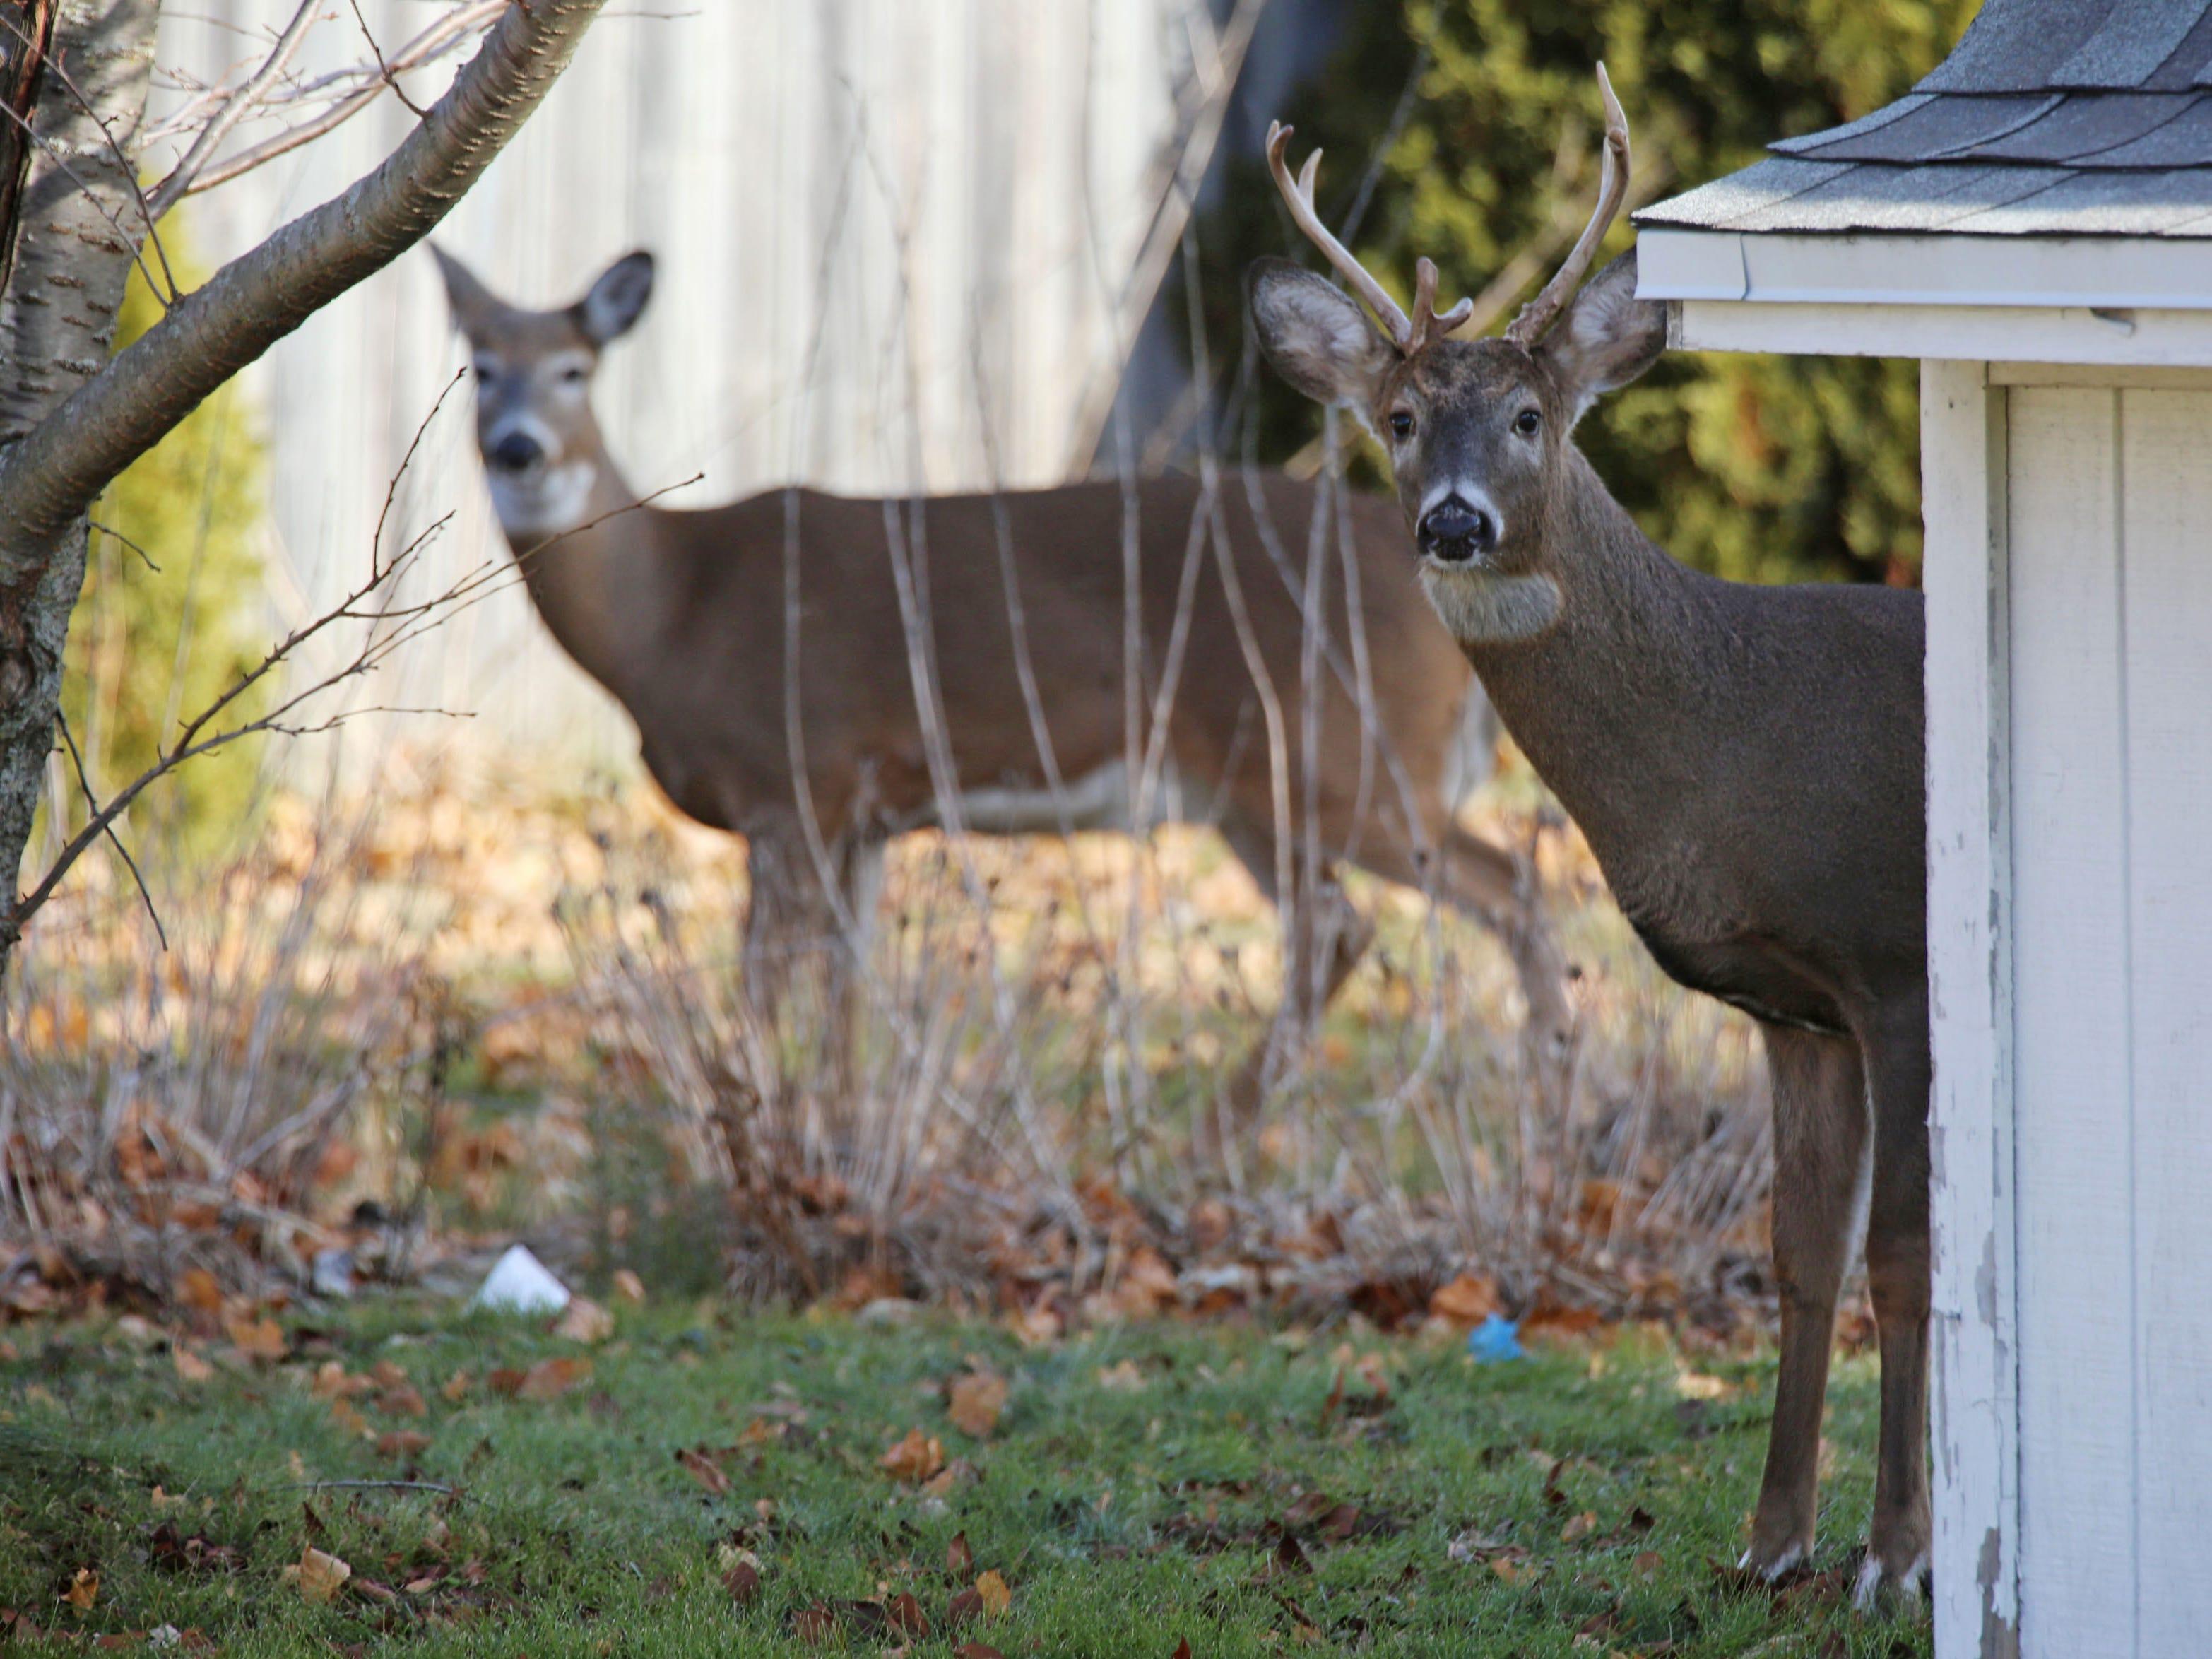 Deer poke around in backyards in the 1000 block of North 23rd Street in Sheboygan, Tuesday, November 27, 2018 in Sheboygan, Wis.